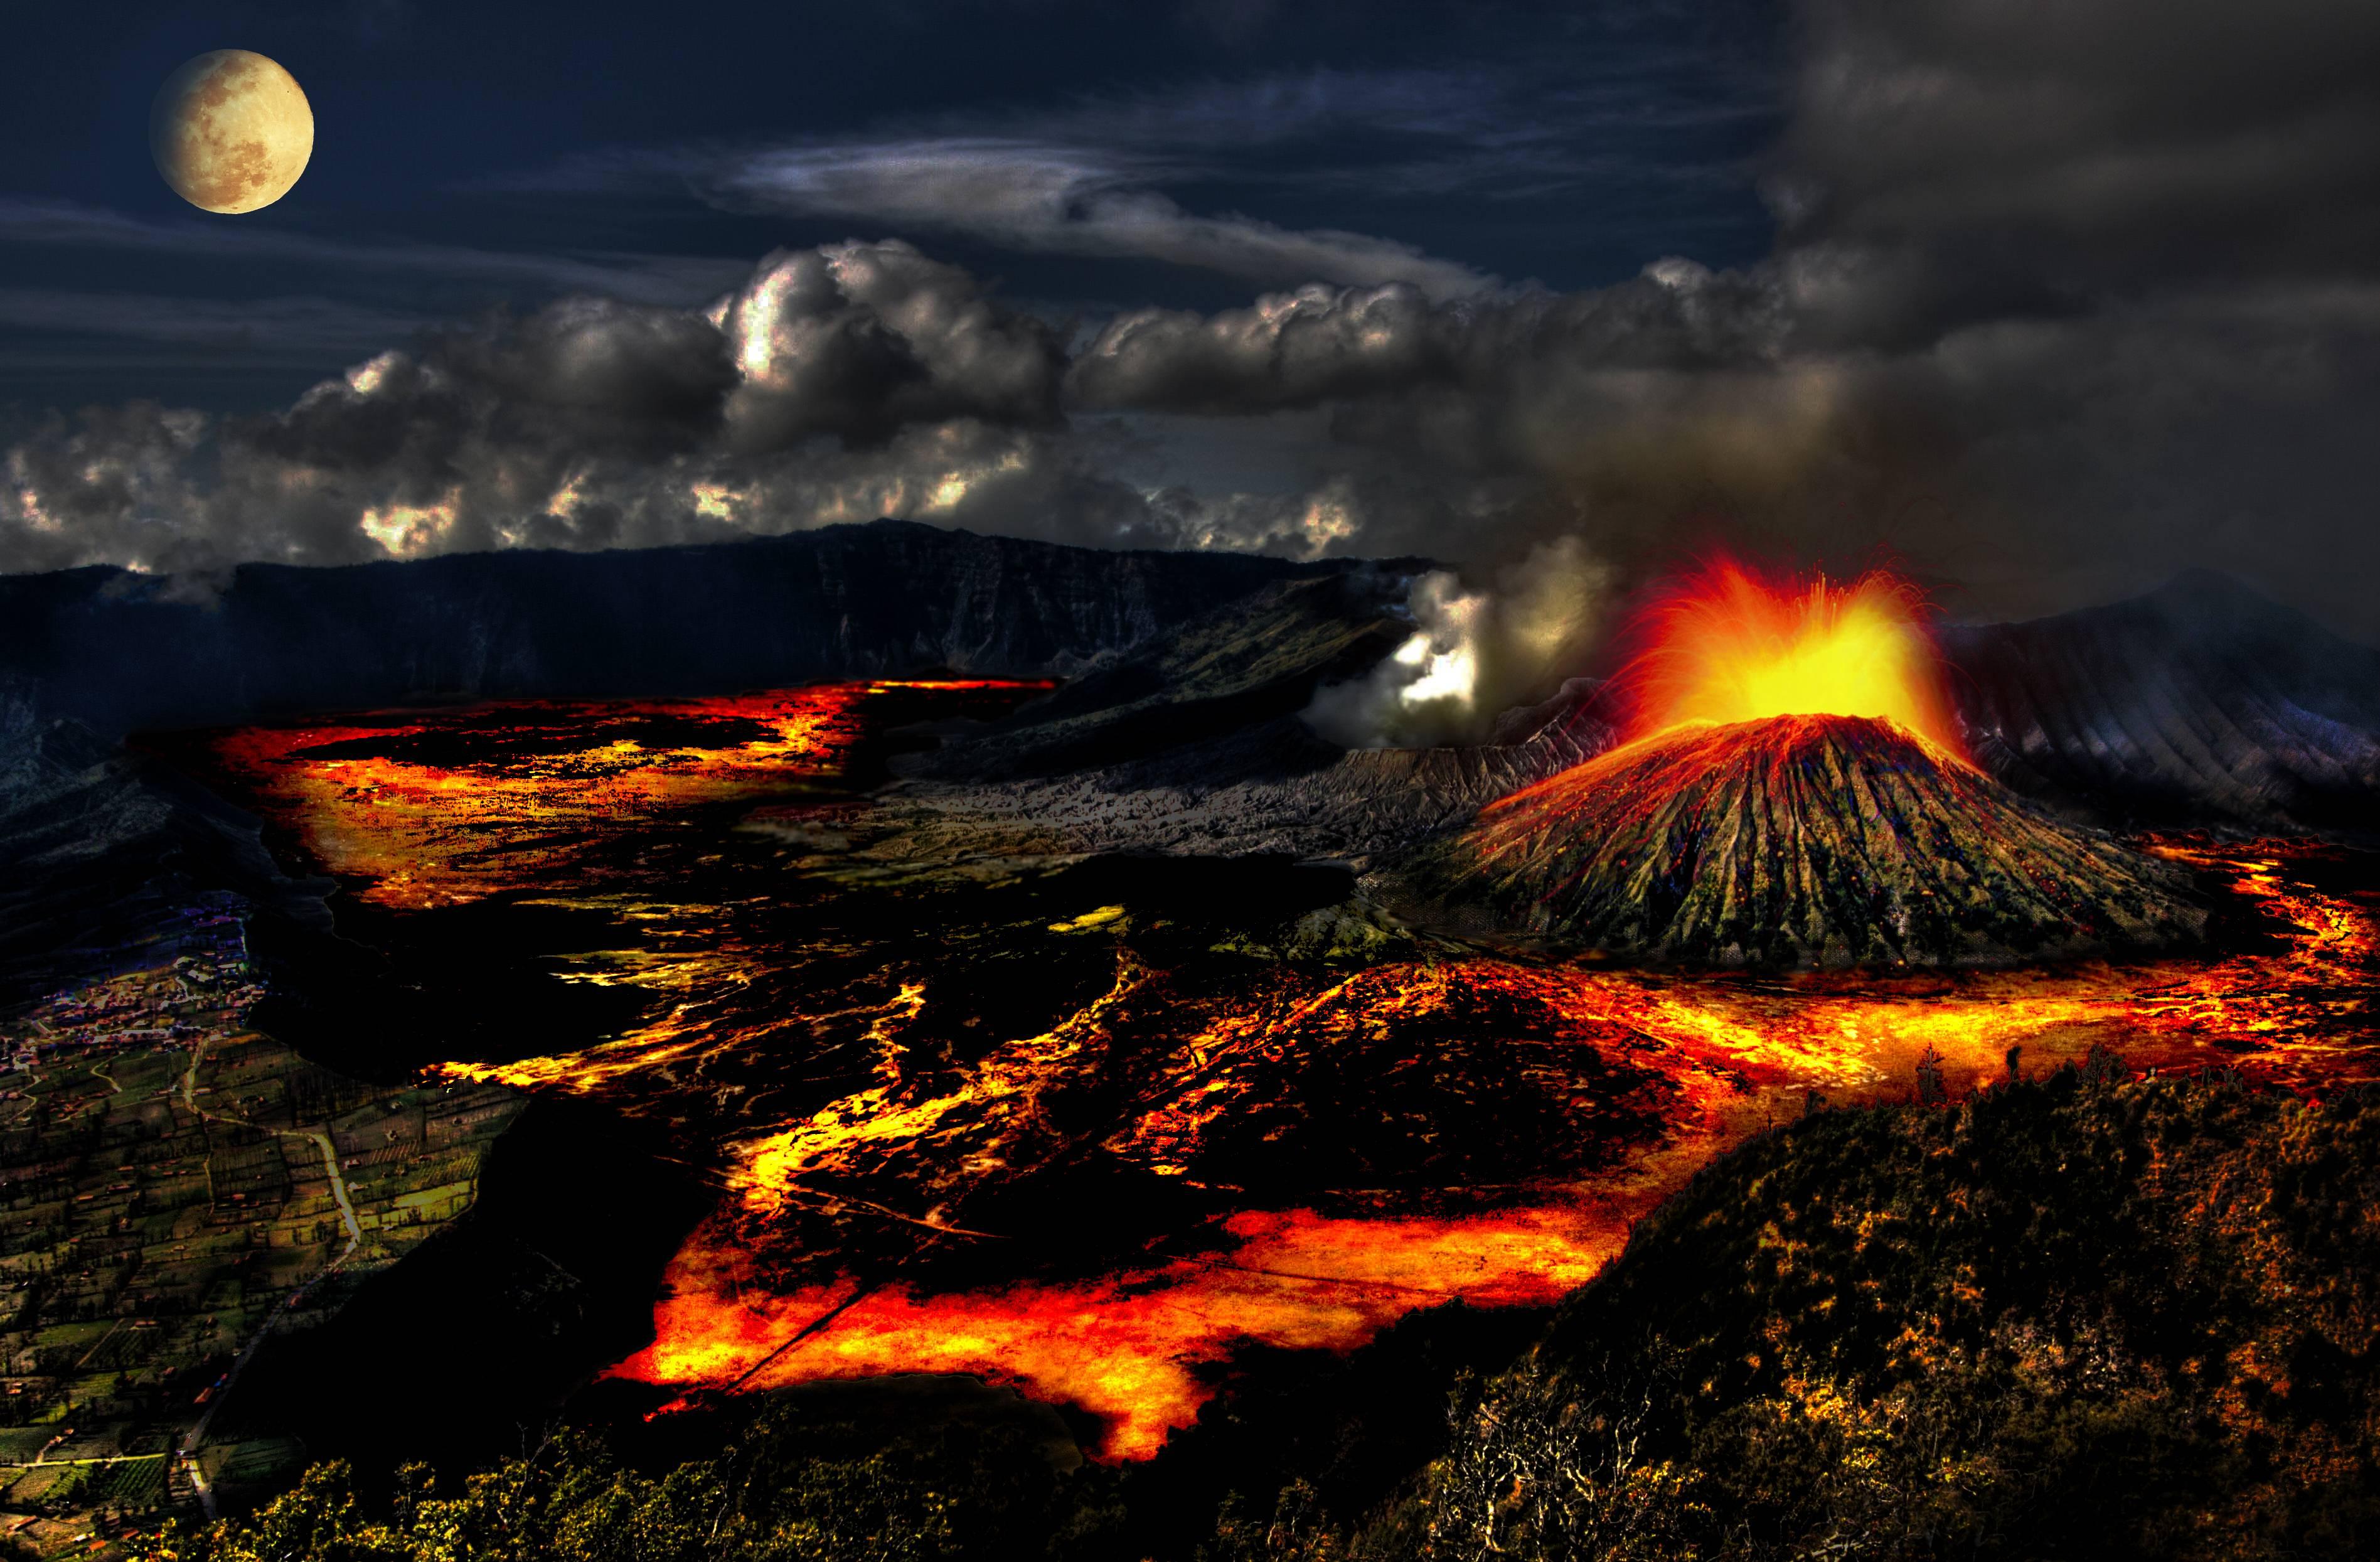 Volcano Wallpapers   Top Volcano Backgrounds   WallpaperAccess 3793x2489